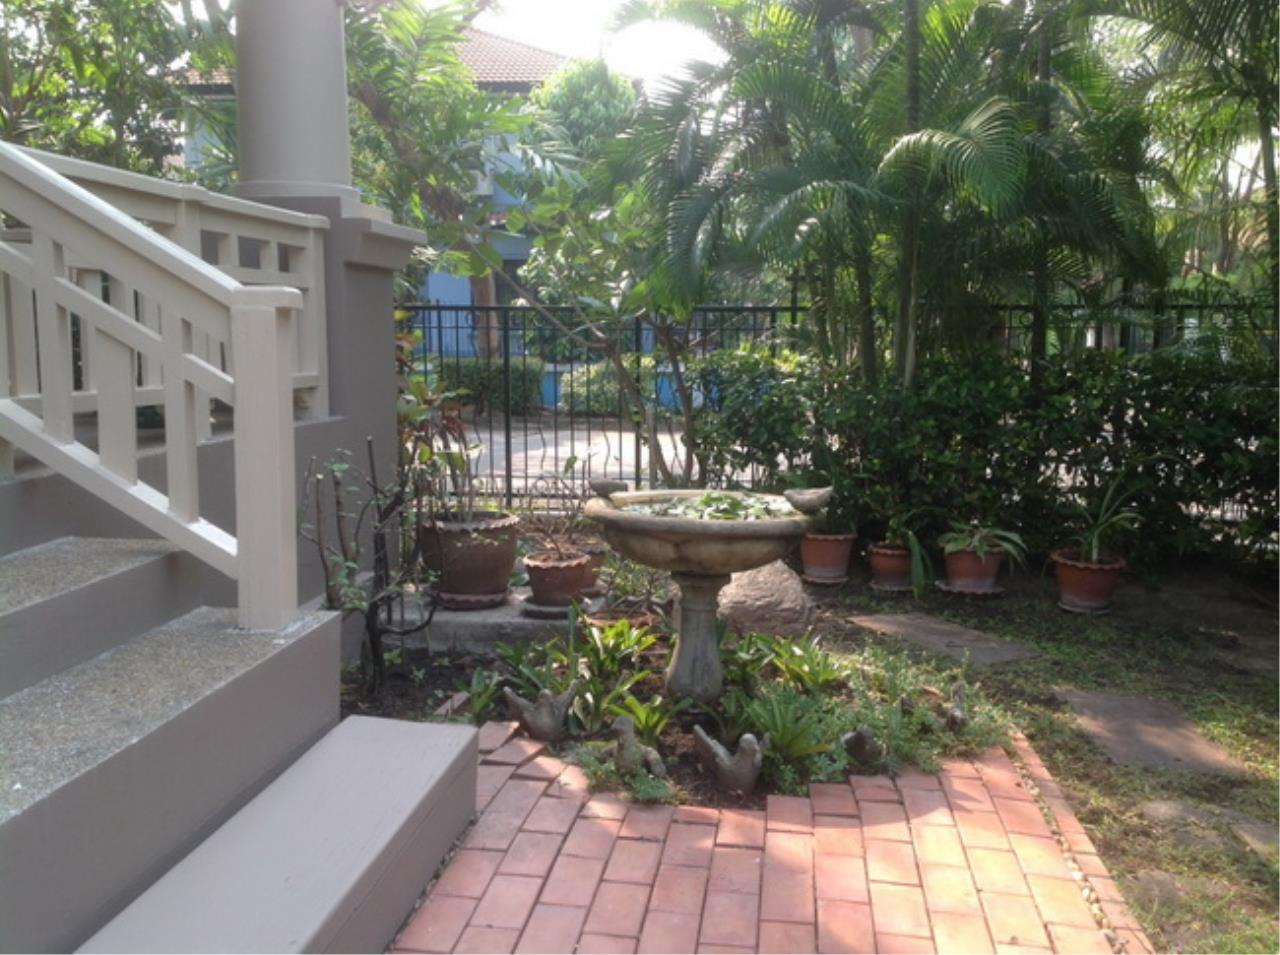 37798 - Single House for sale Pracha Uthit Road 75 sqw, ภาพที่ 3